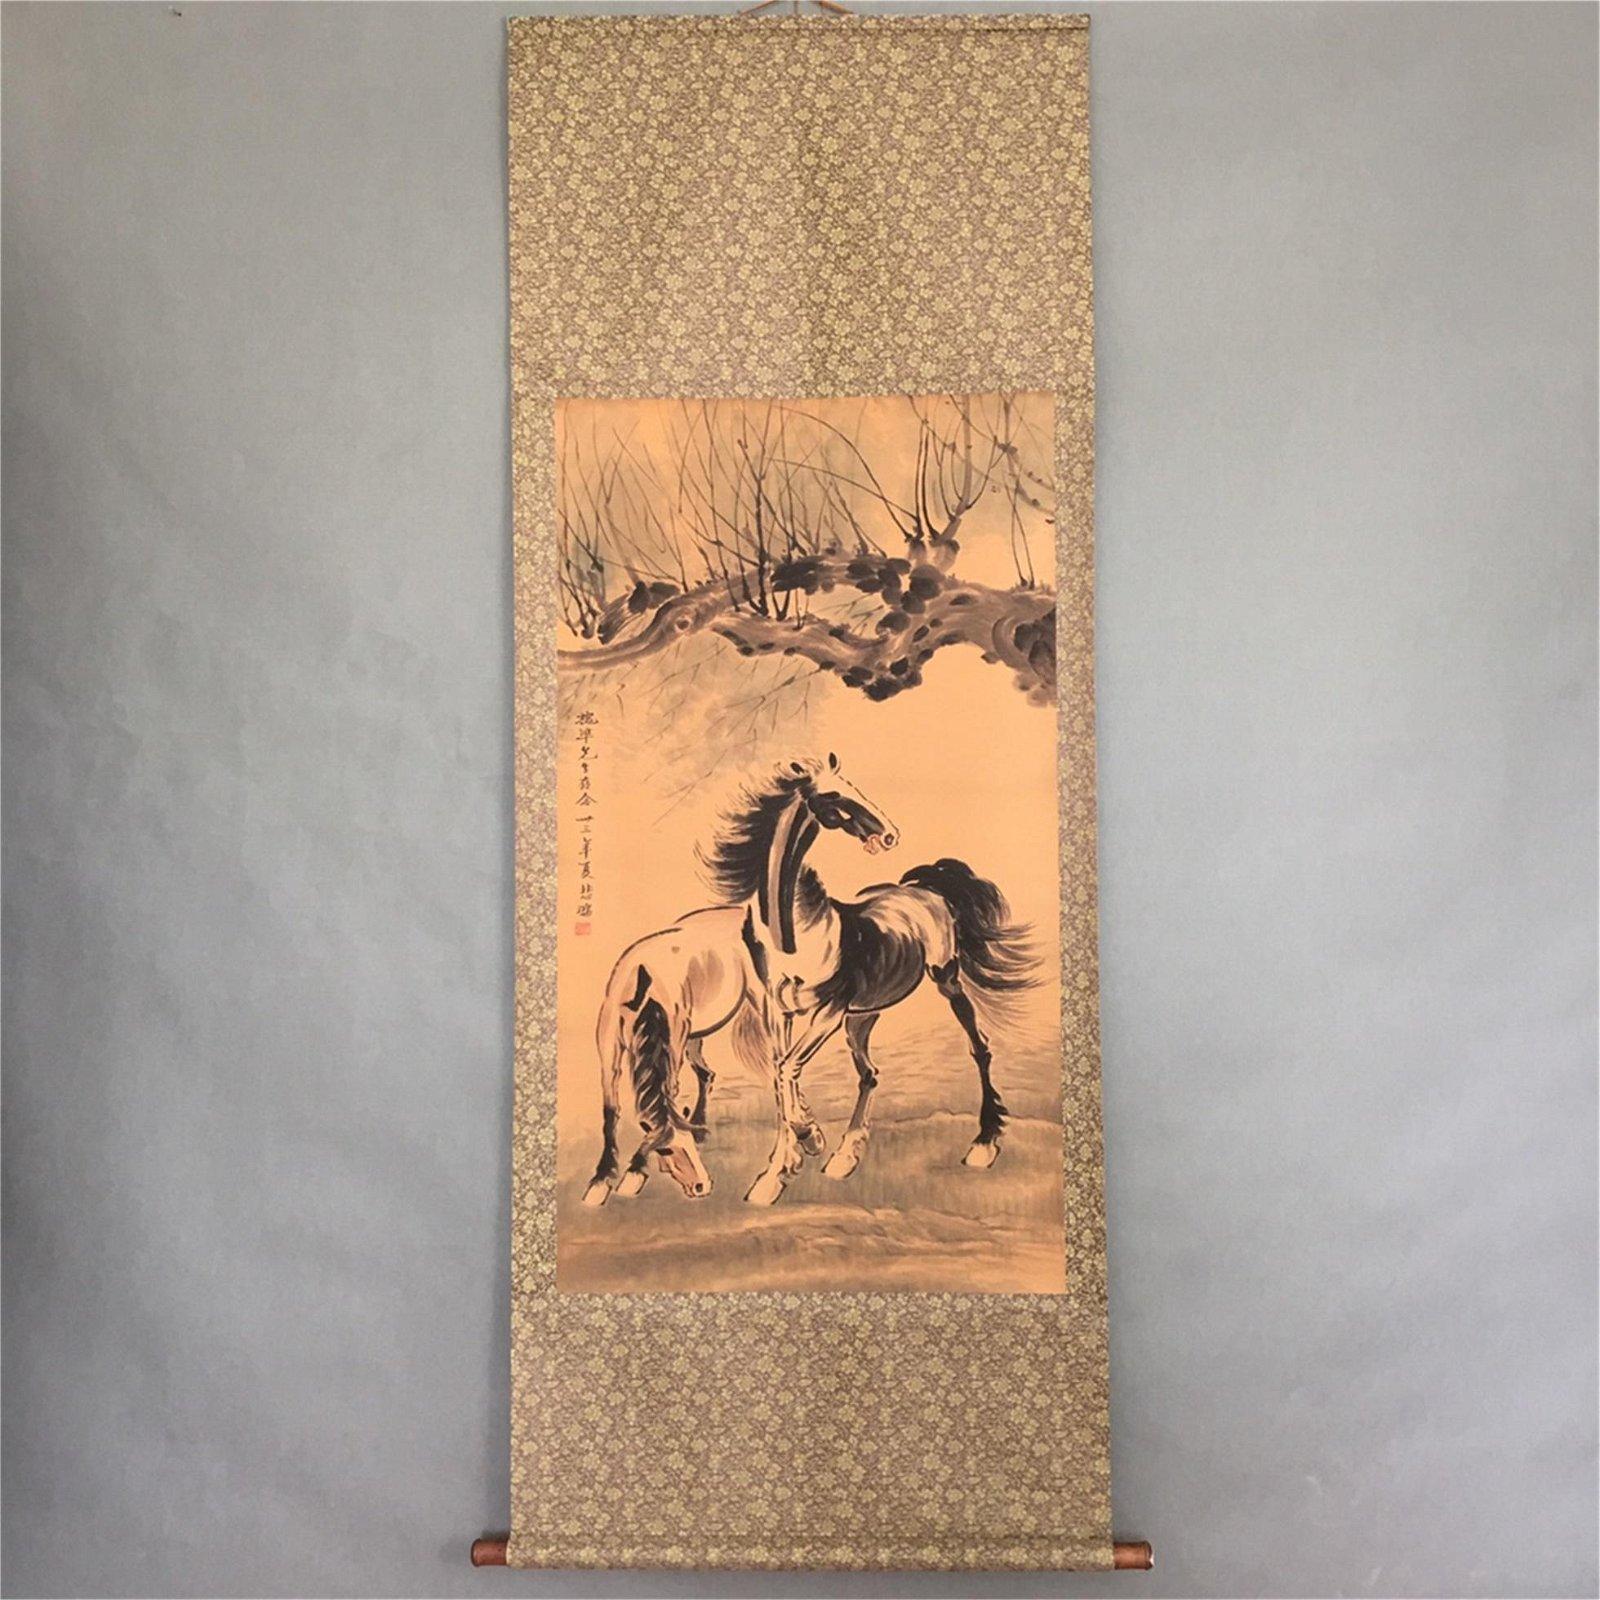 A Chinese Scroll Painting, Xu Beihong Mark